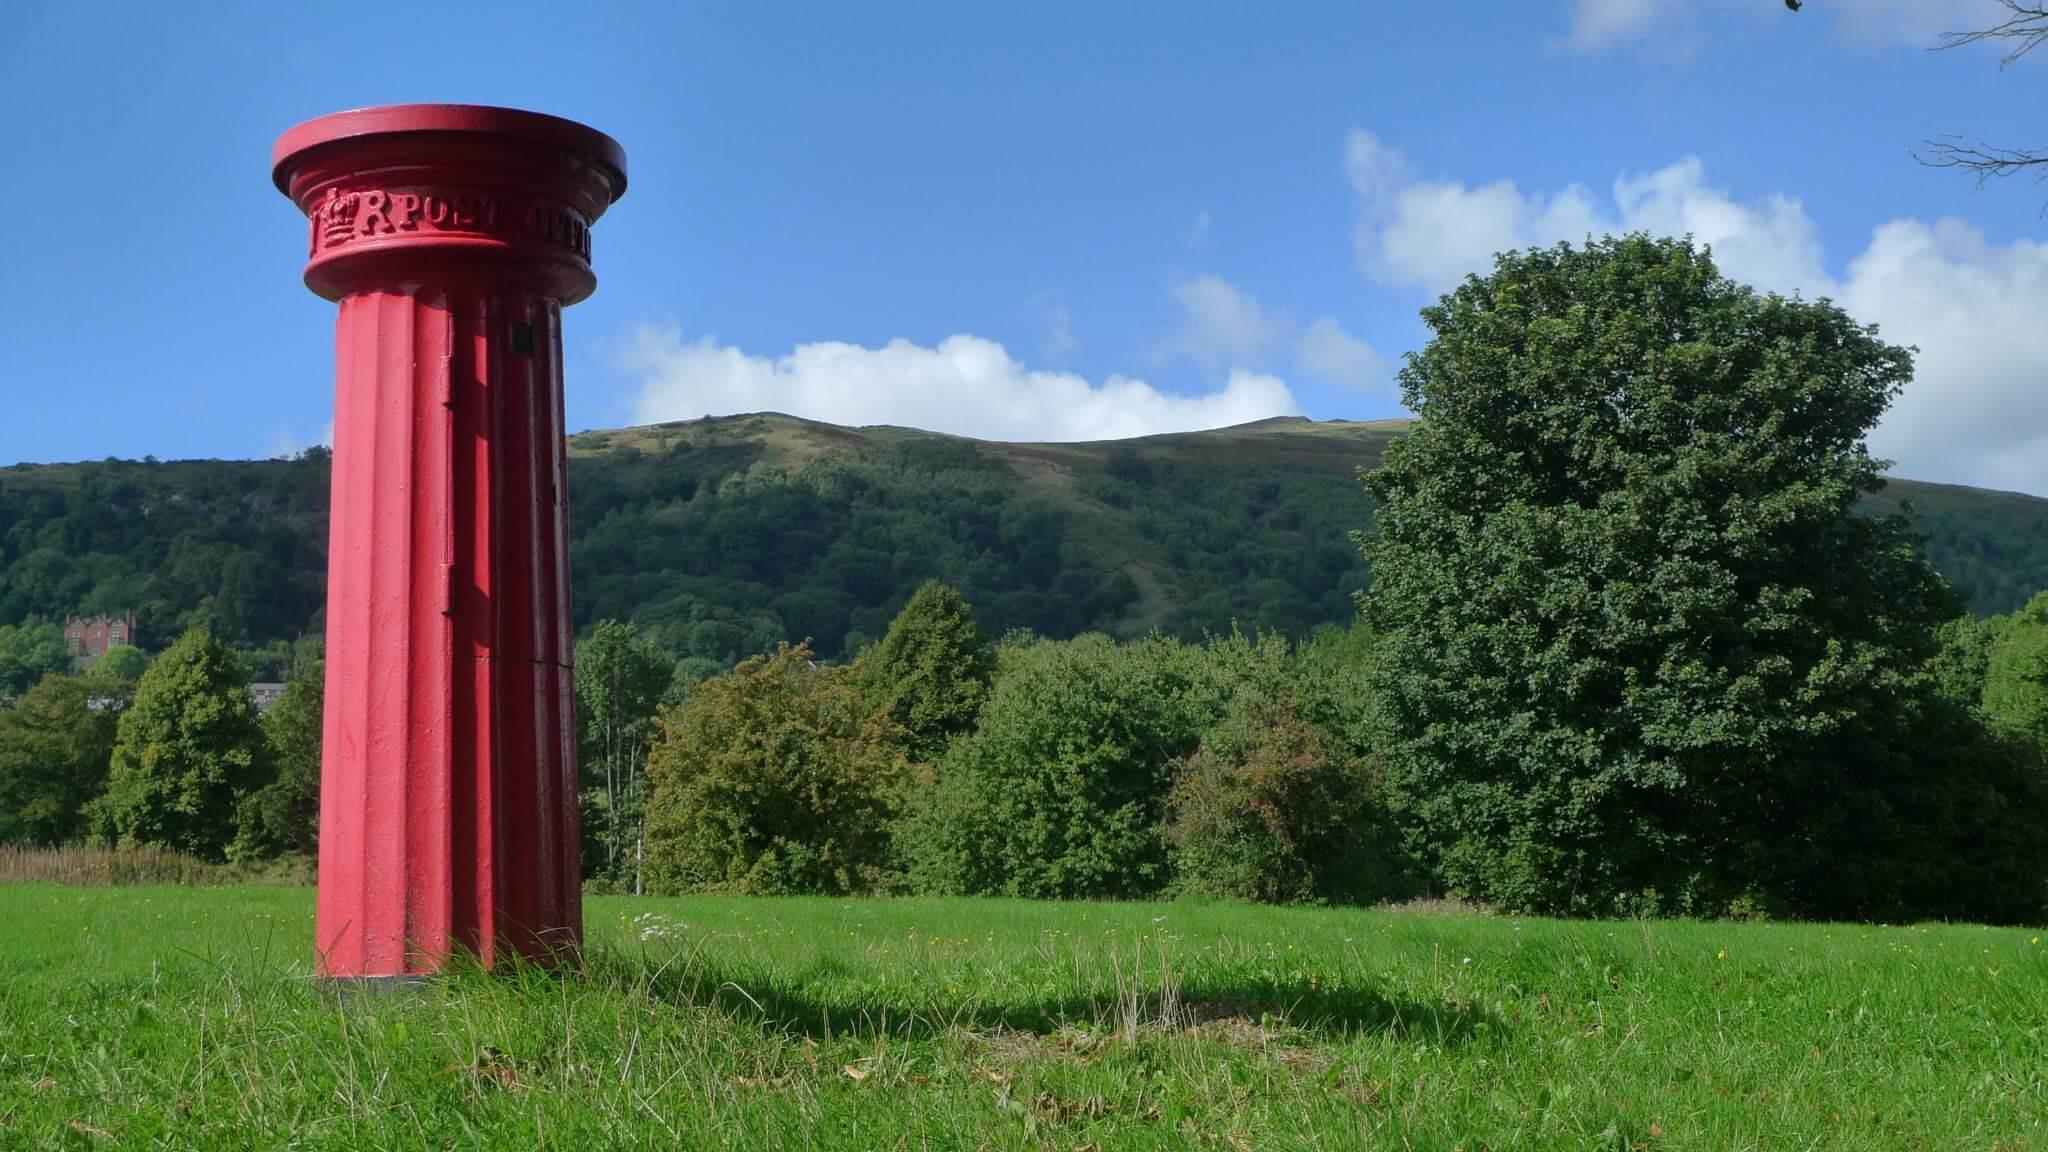 Postbox in Malvern